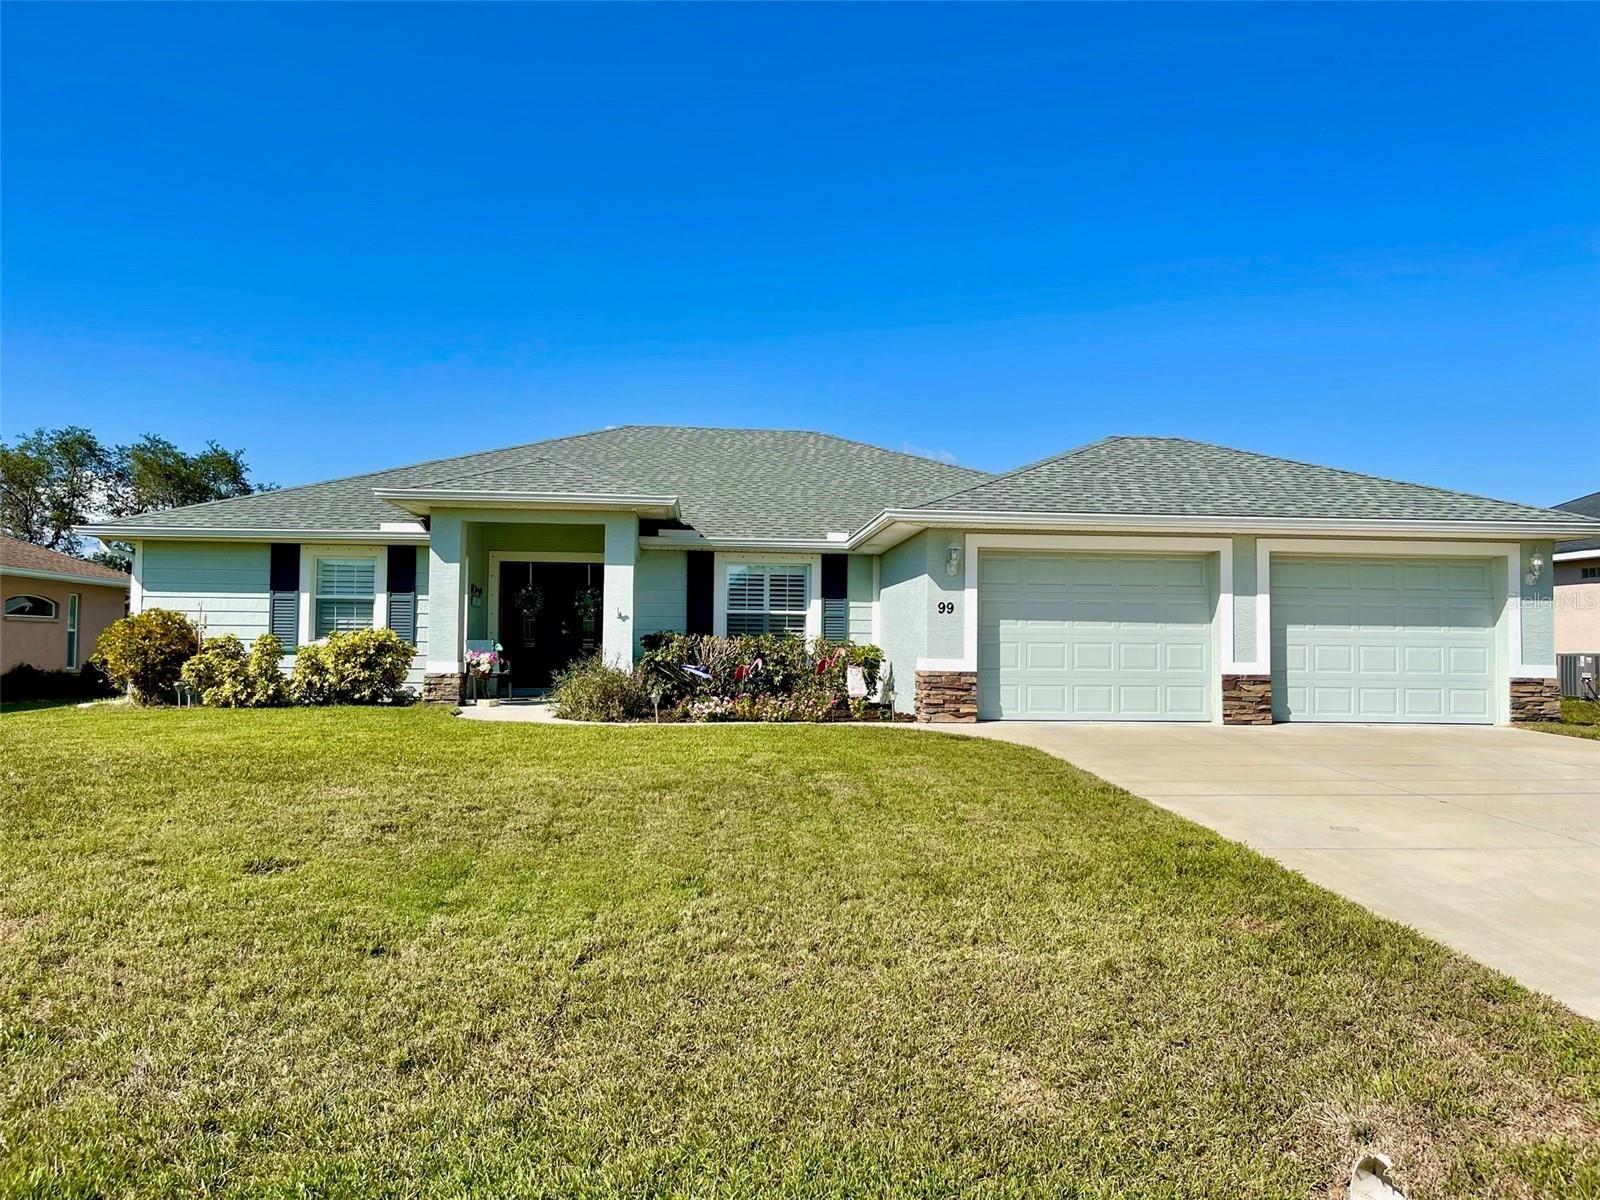 99 PINE VALLEY LANE, Rotonda, FL 33947 - MLS#: A4503510